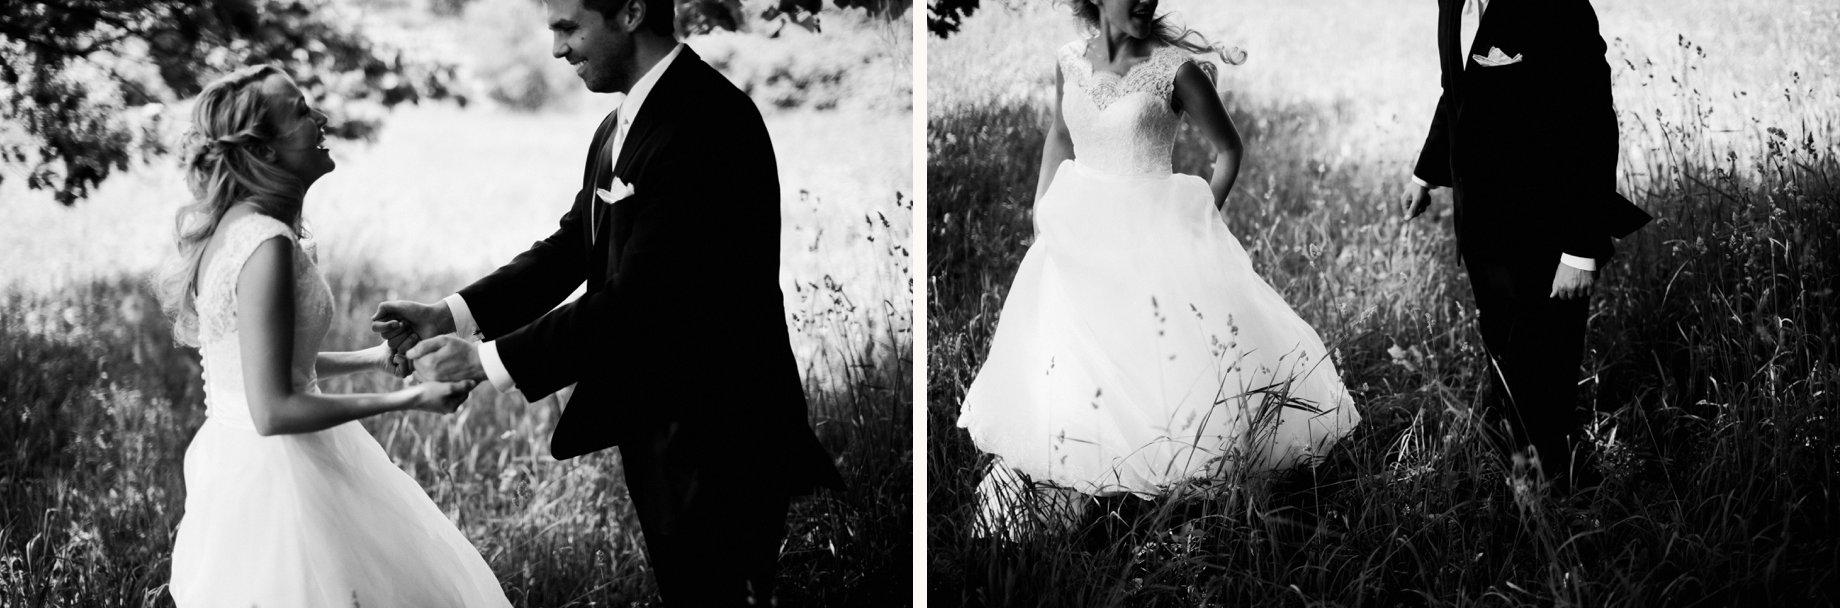 black and white port huron wedding photography